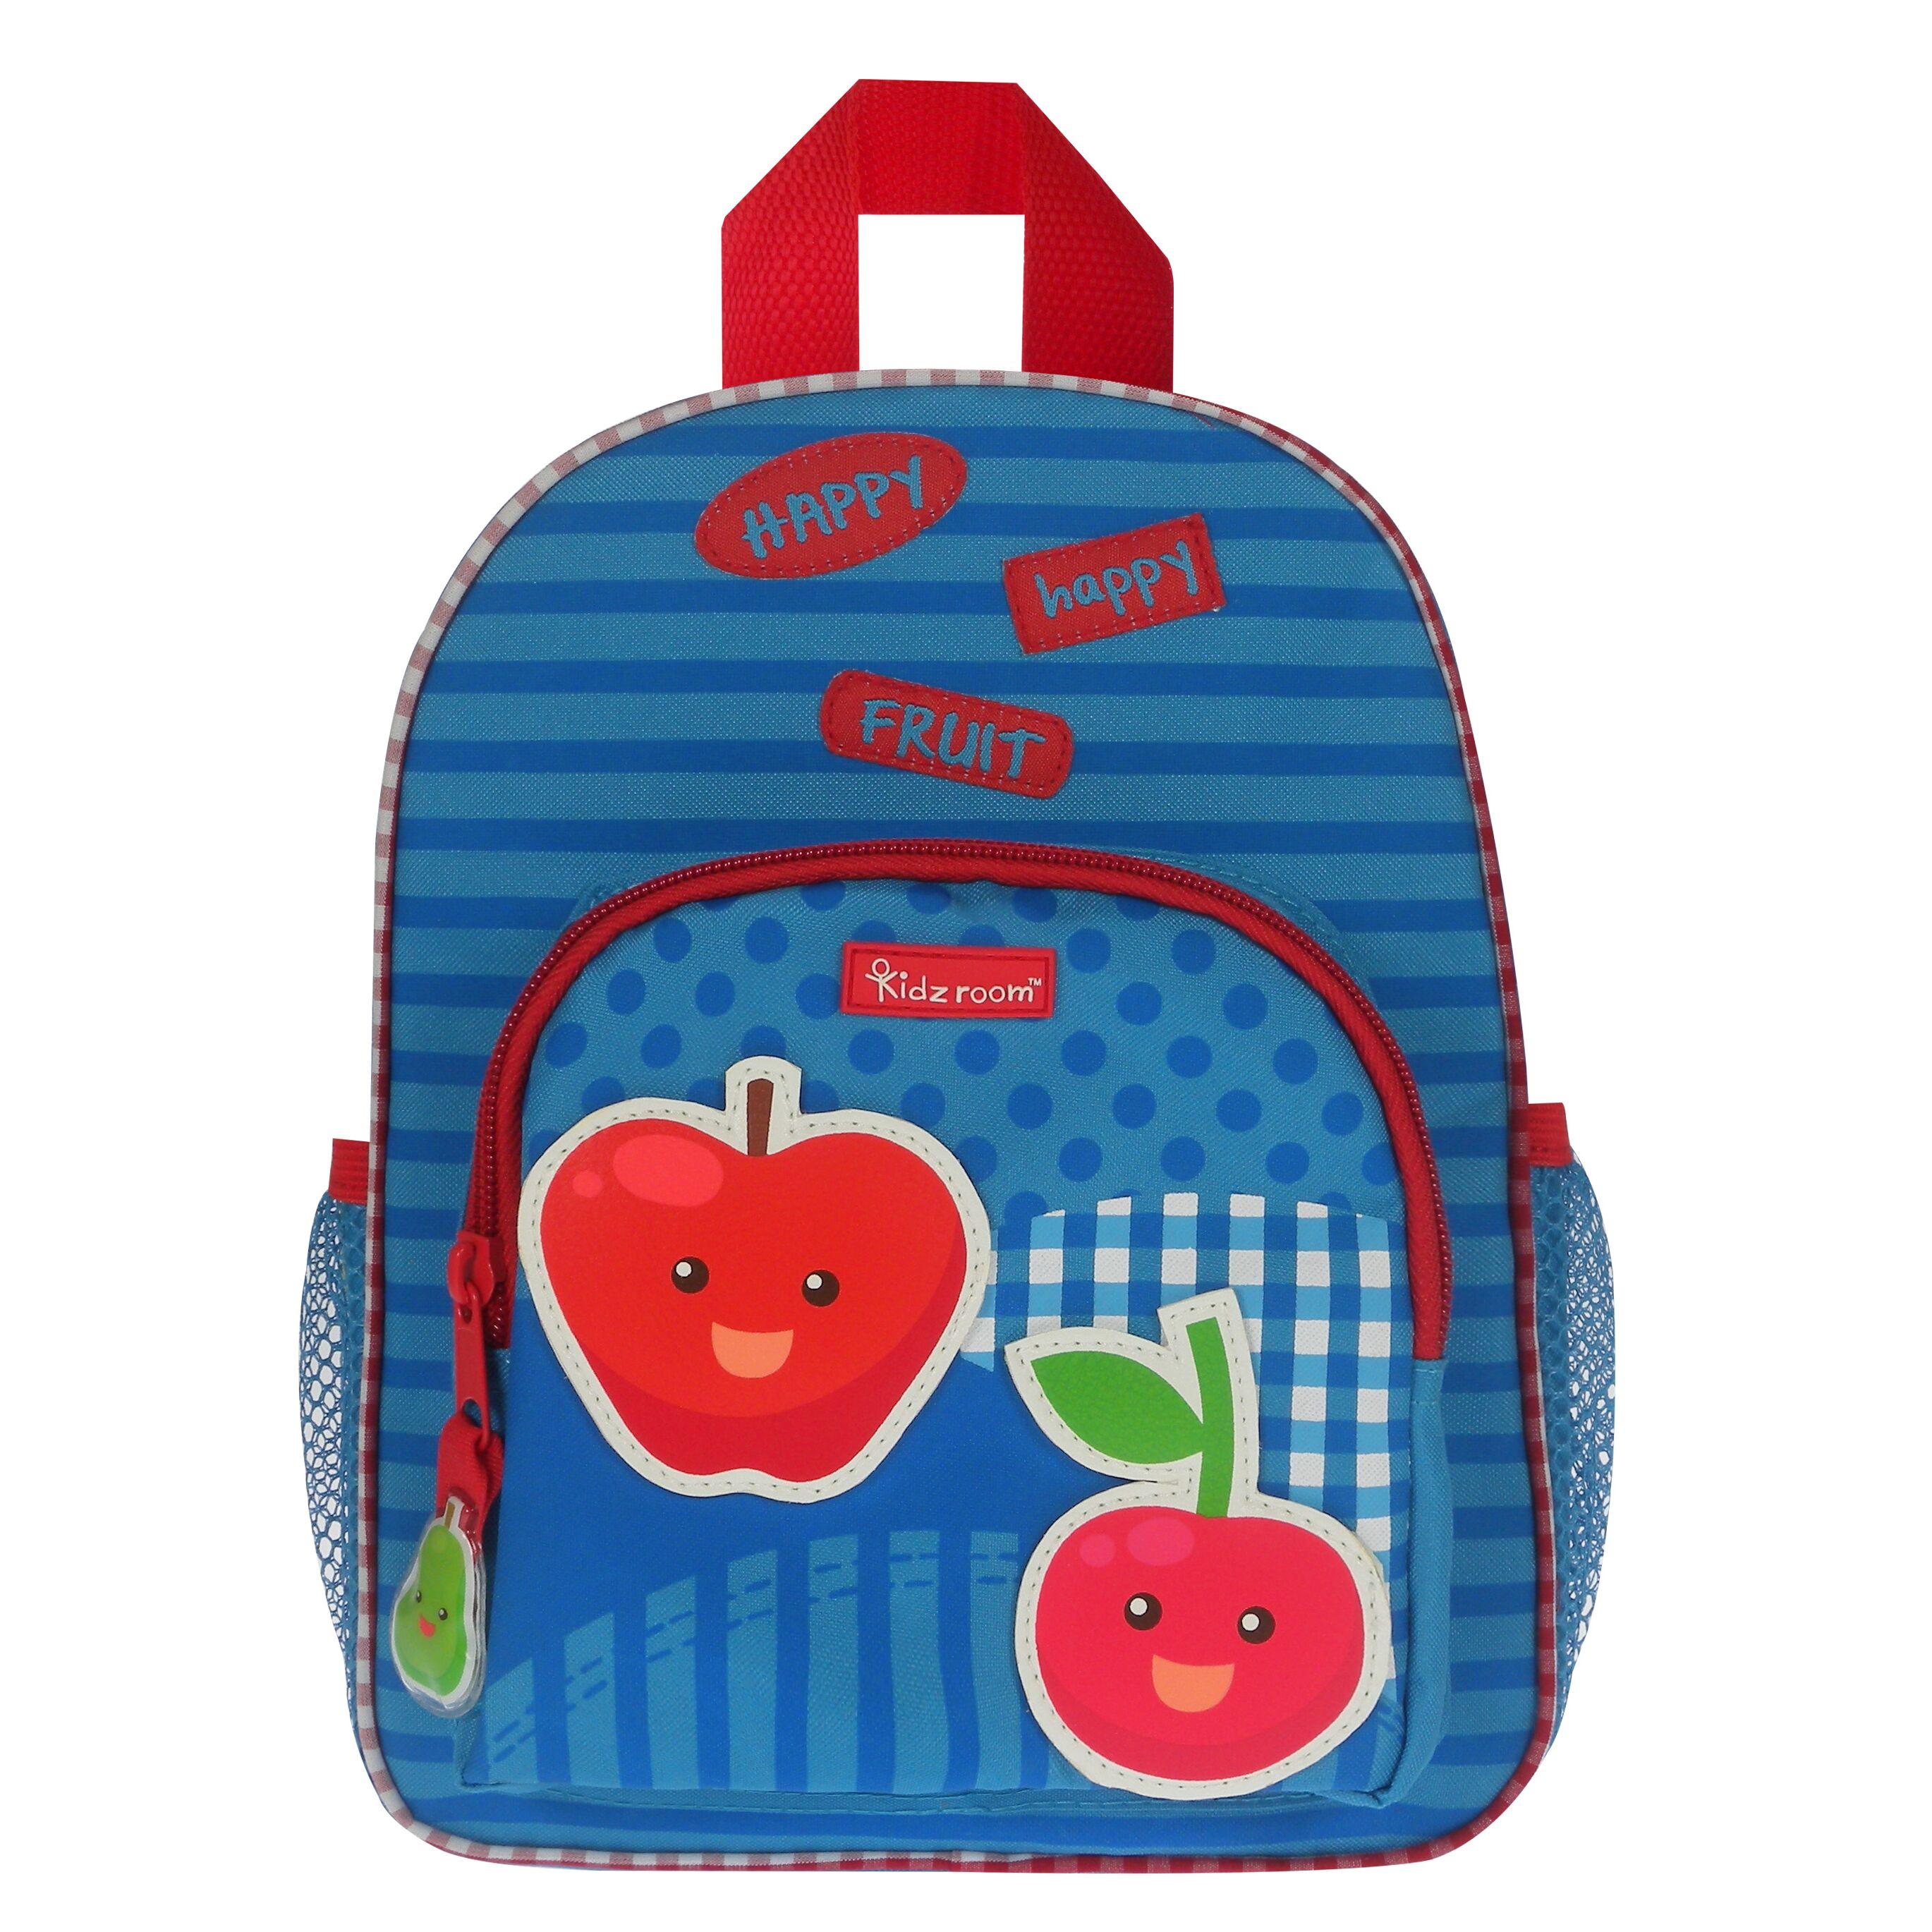 81665e86017 Σχολικά - Βιβλία :: Σχολικές Τσάντες :: Σακίδιο Πλάτης Kidzroom Veggies  Happy Fruit